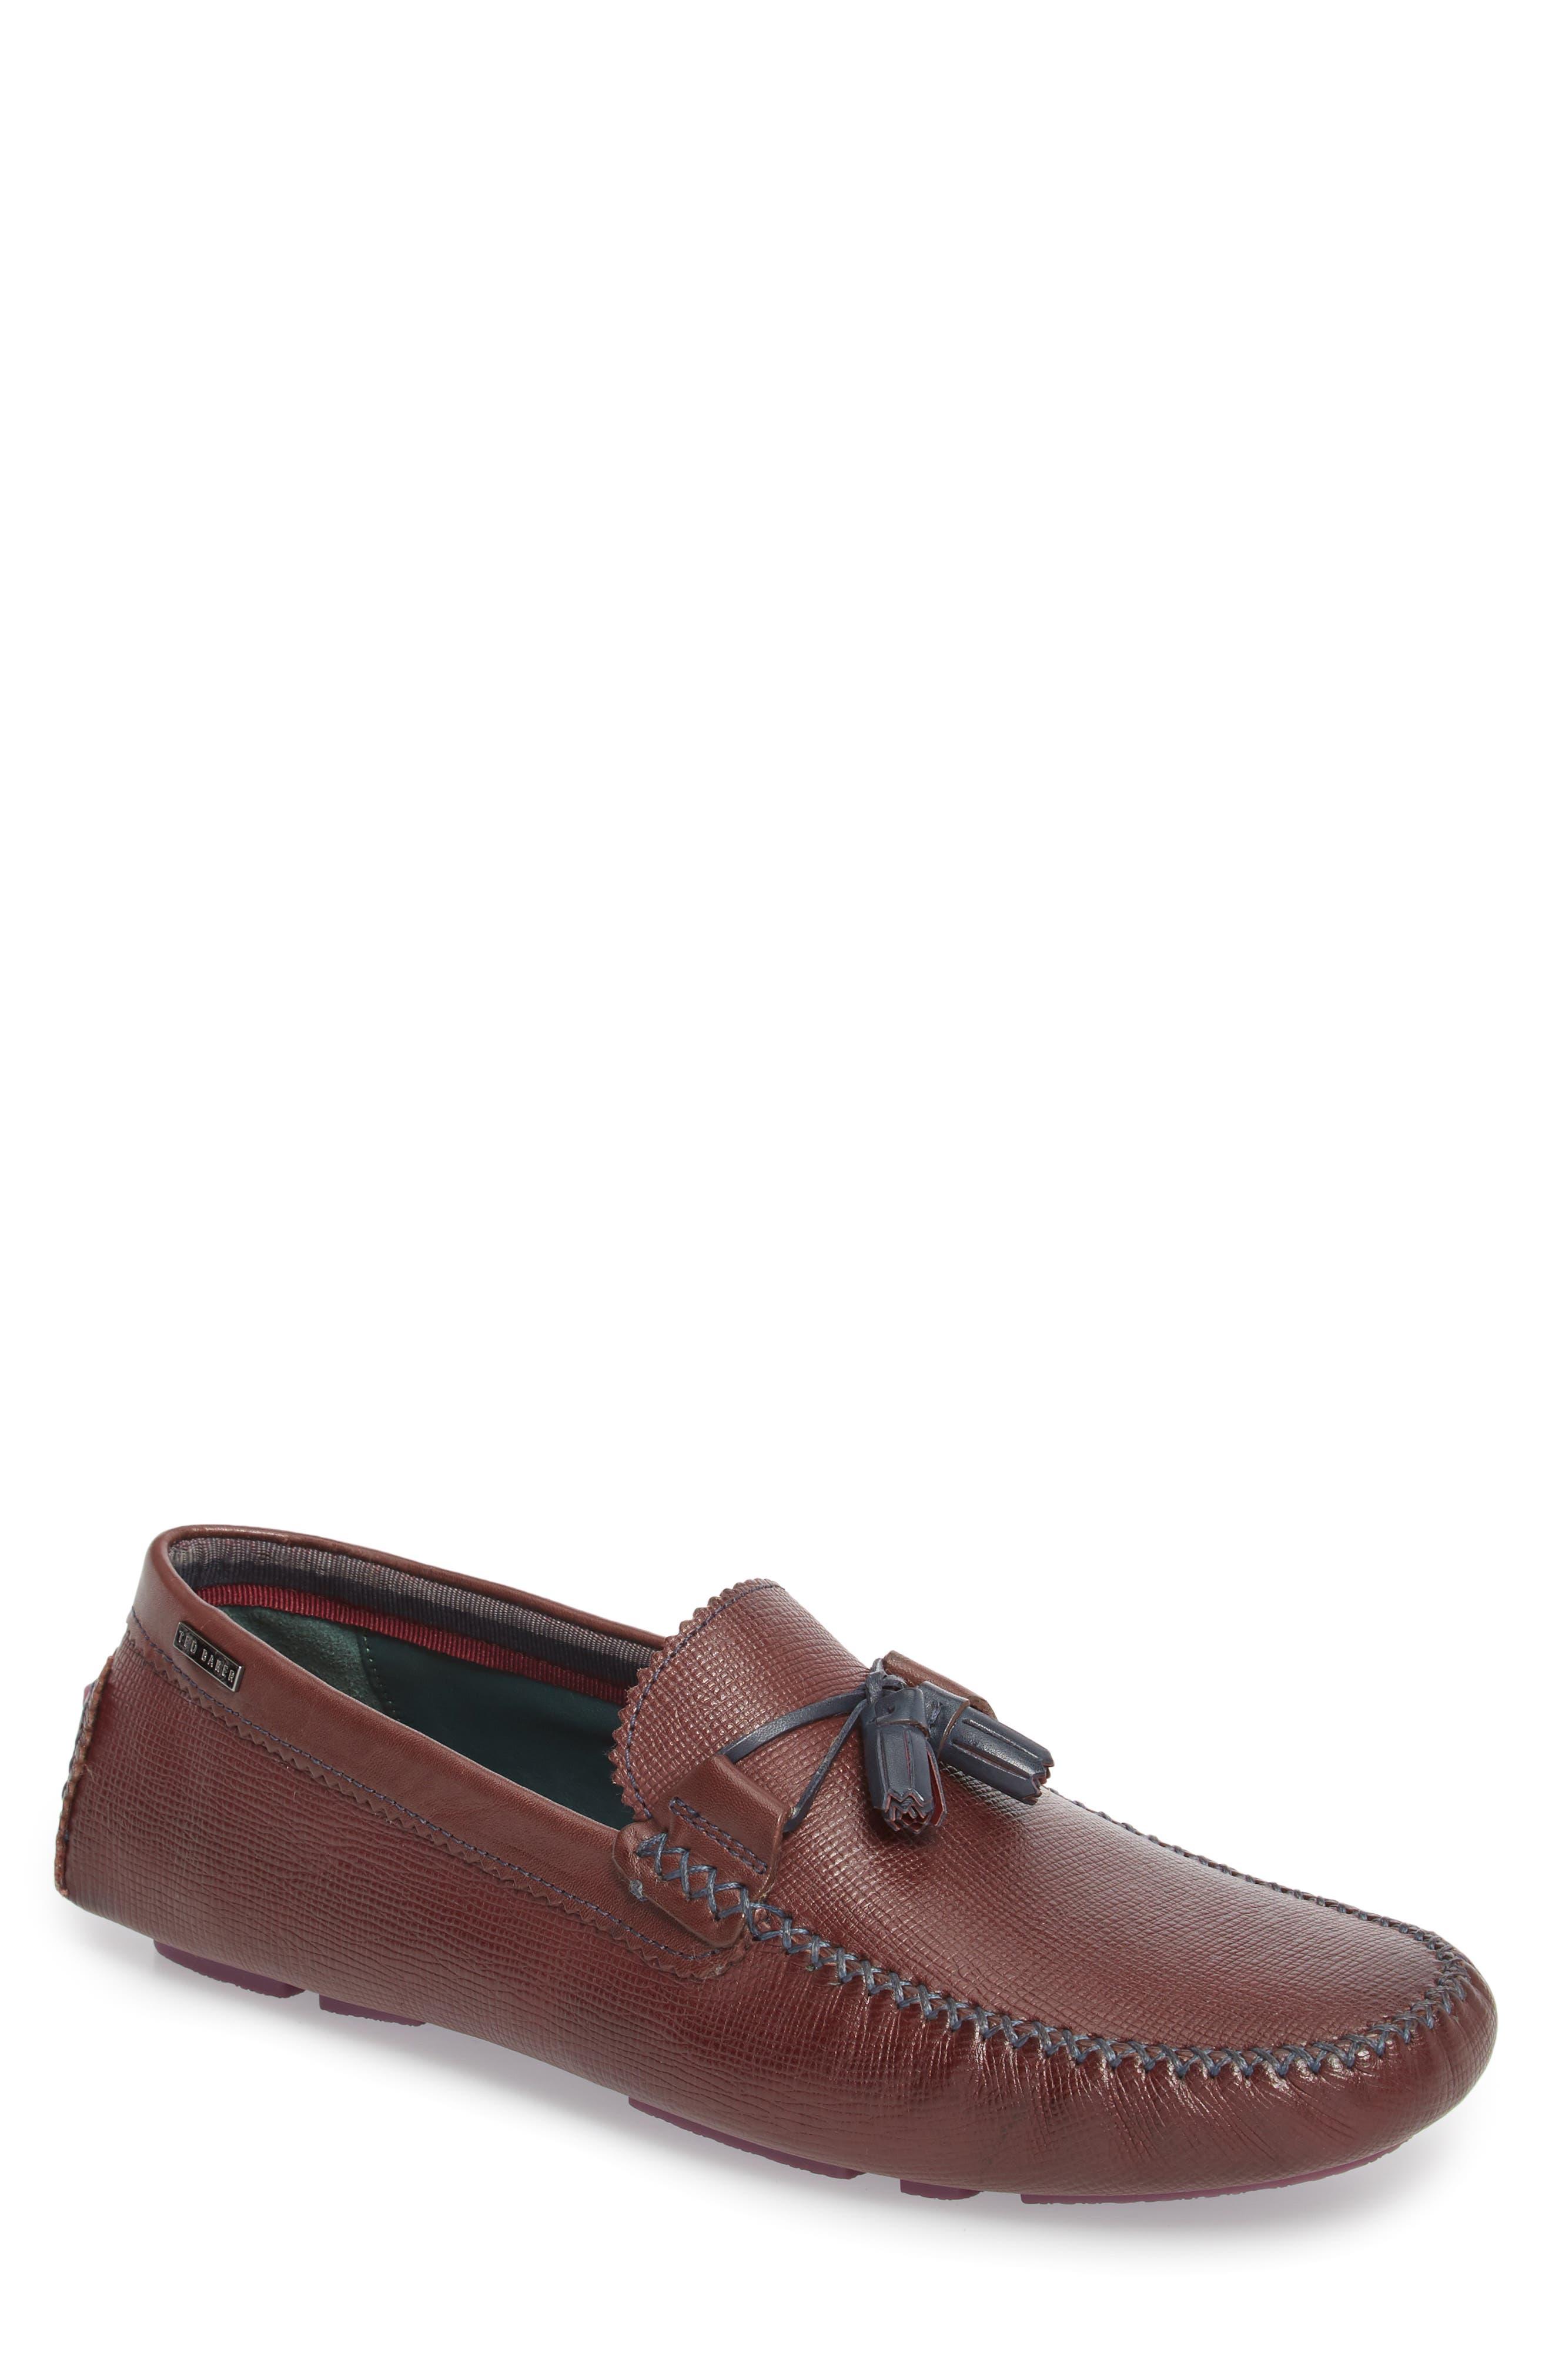 Urbonn Tasseled Driving Loafer,                             Main thumbnail 1, color,                             Dark Red Leather